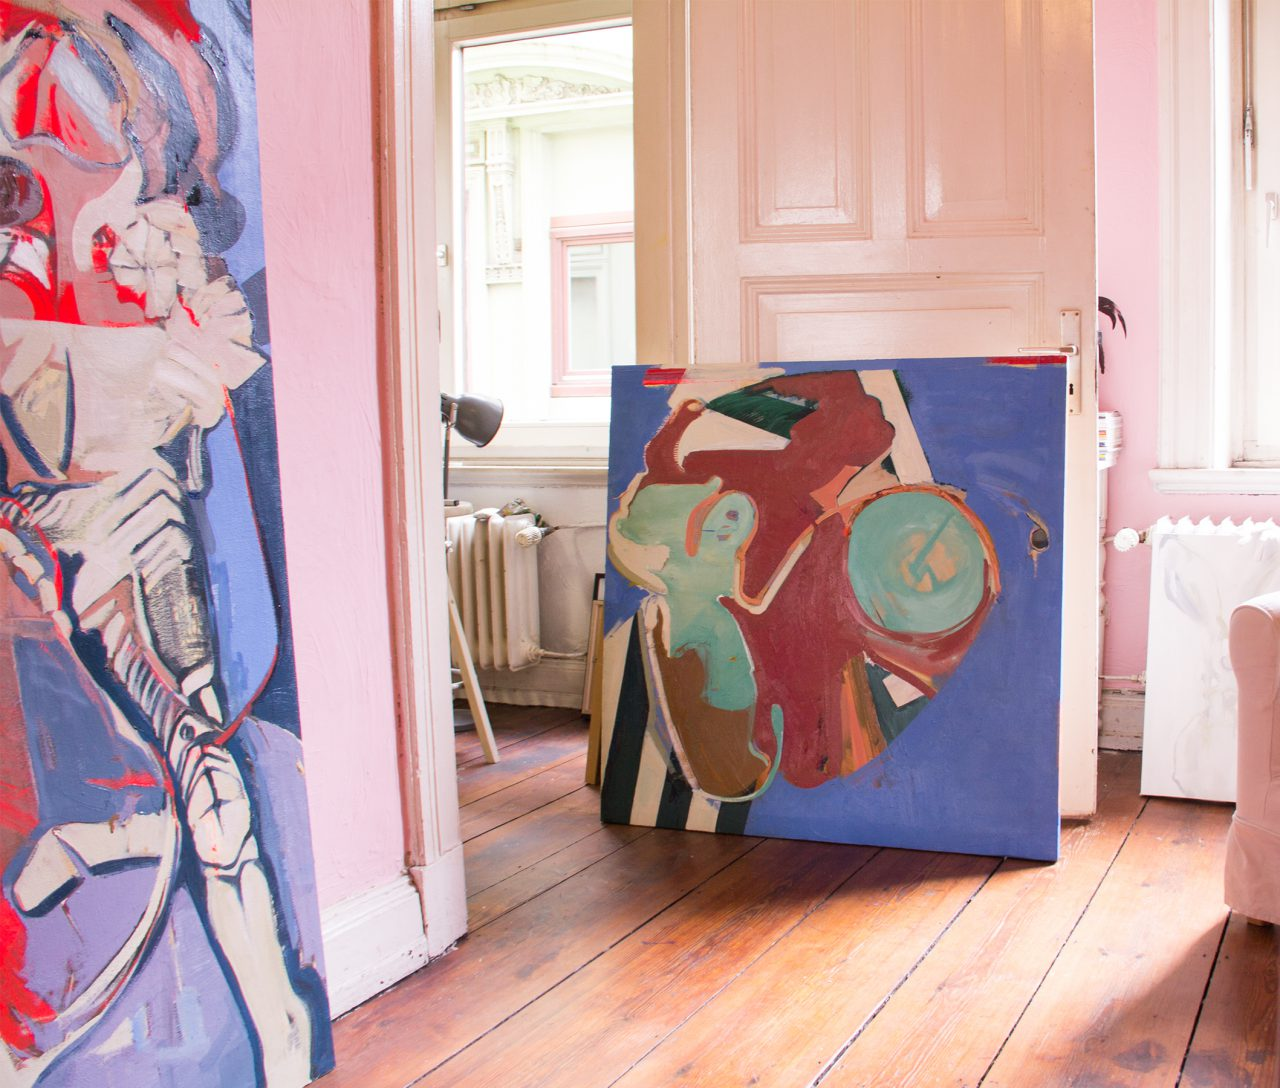 Markisen-Maske aus 25 Farben Stockholm